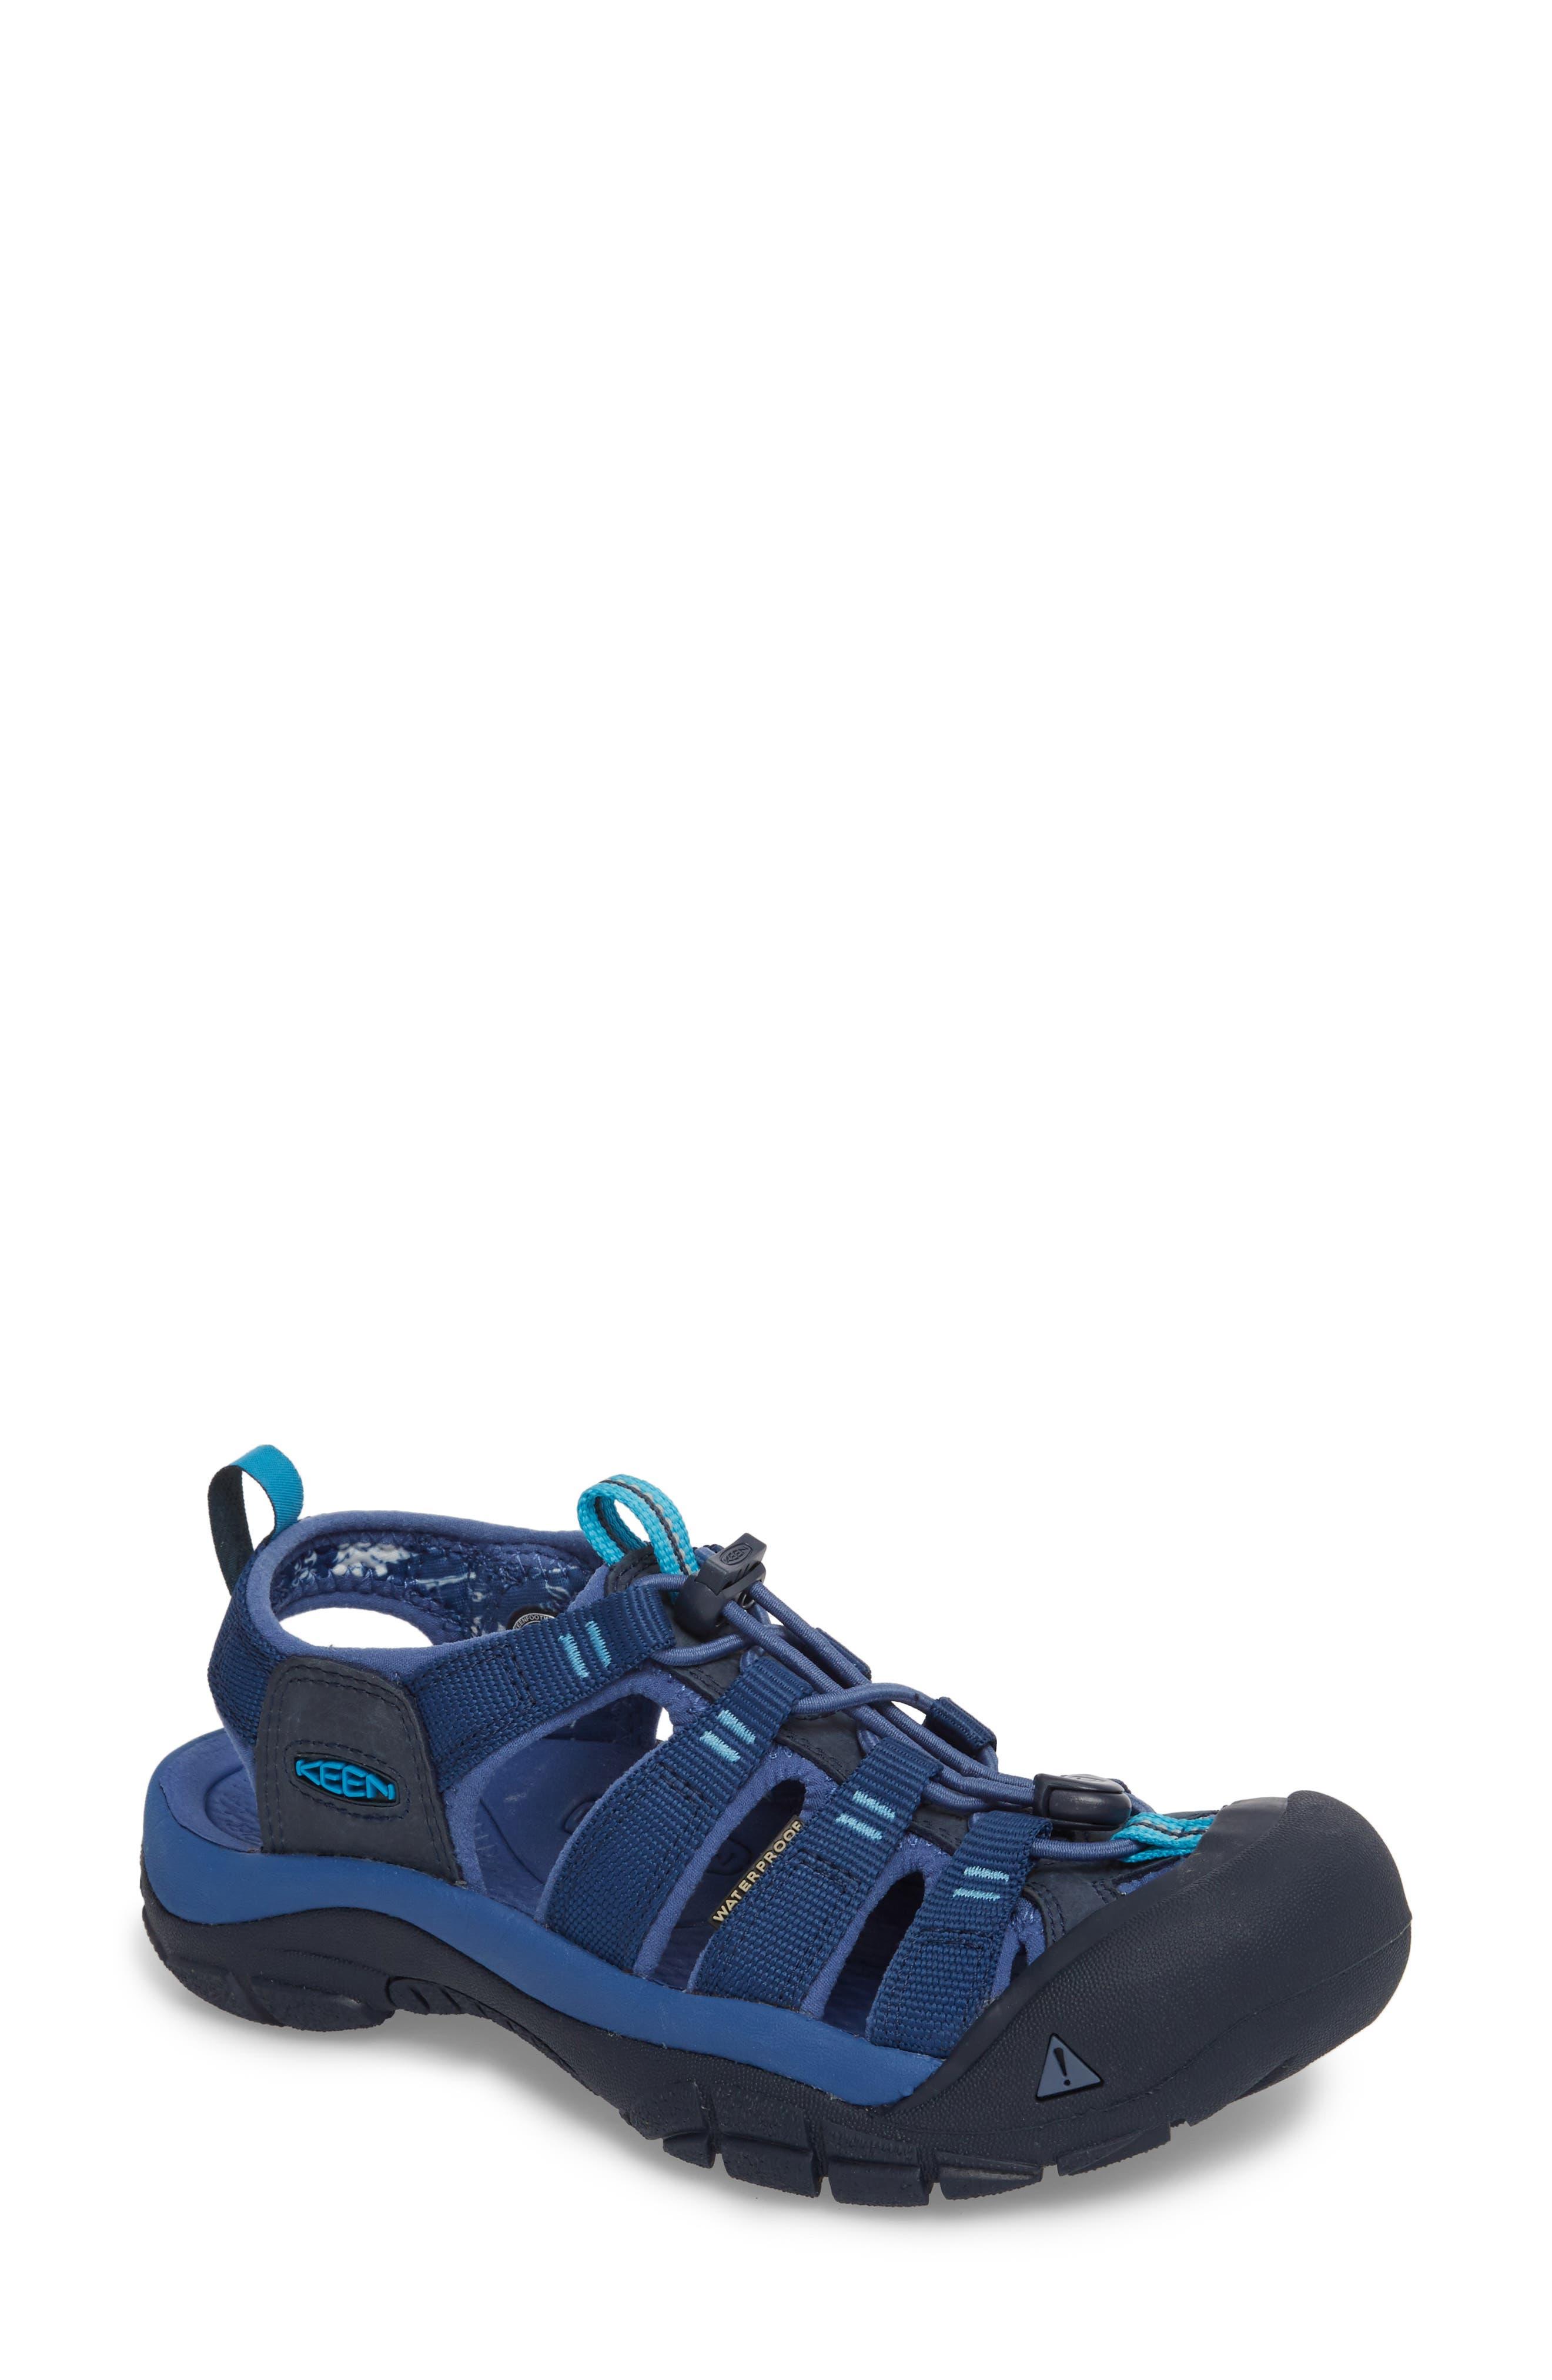 Main Image - Keen Newport Eco Waterproof Sandal (Women)